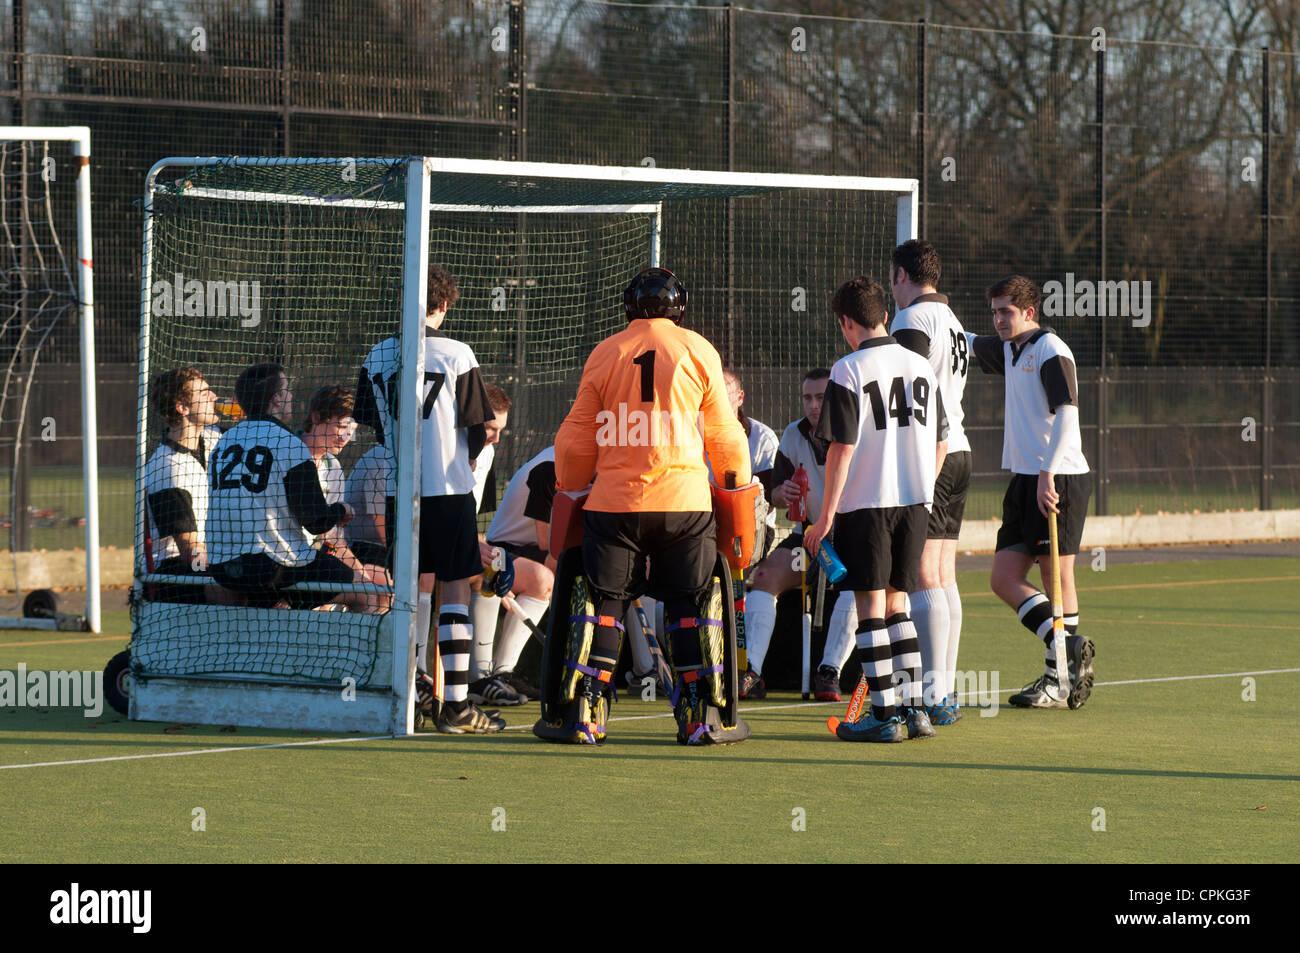 Half time team talk at club hockey match, UK - Stock Image